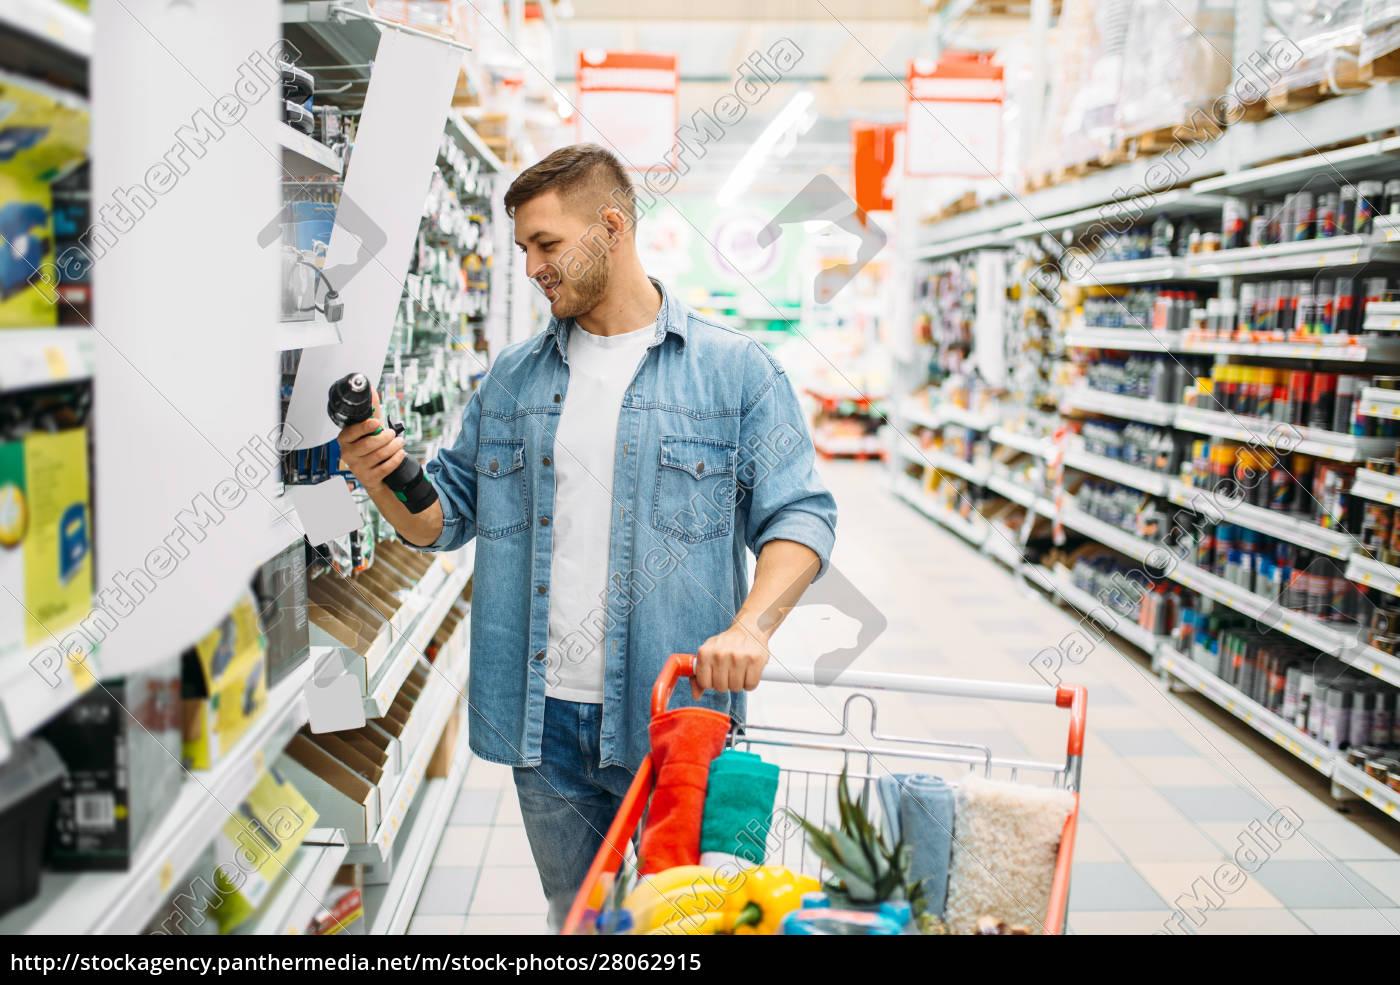 man, choosing, electric, screwdriver, in, supermarket - 28062915